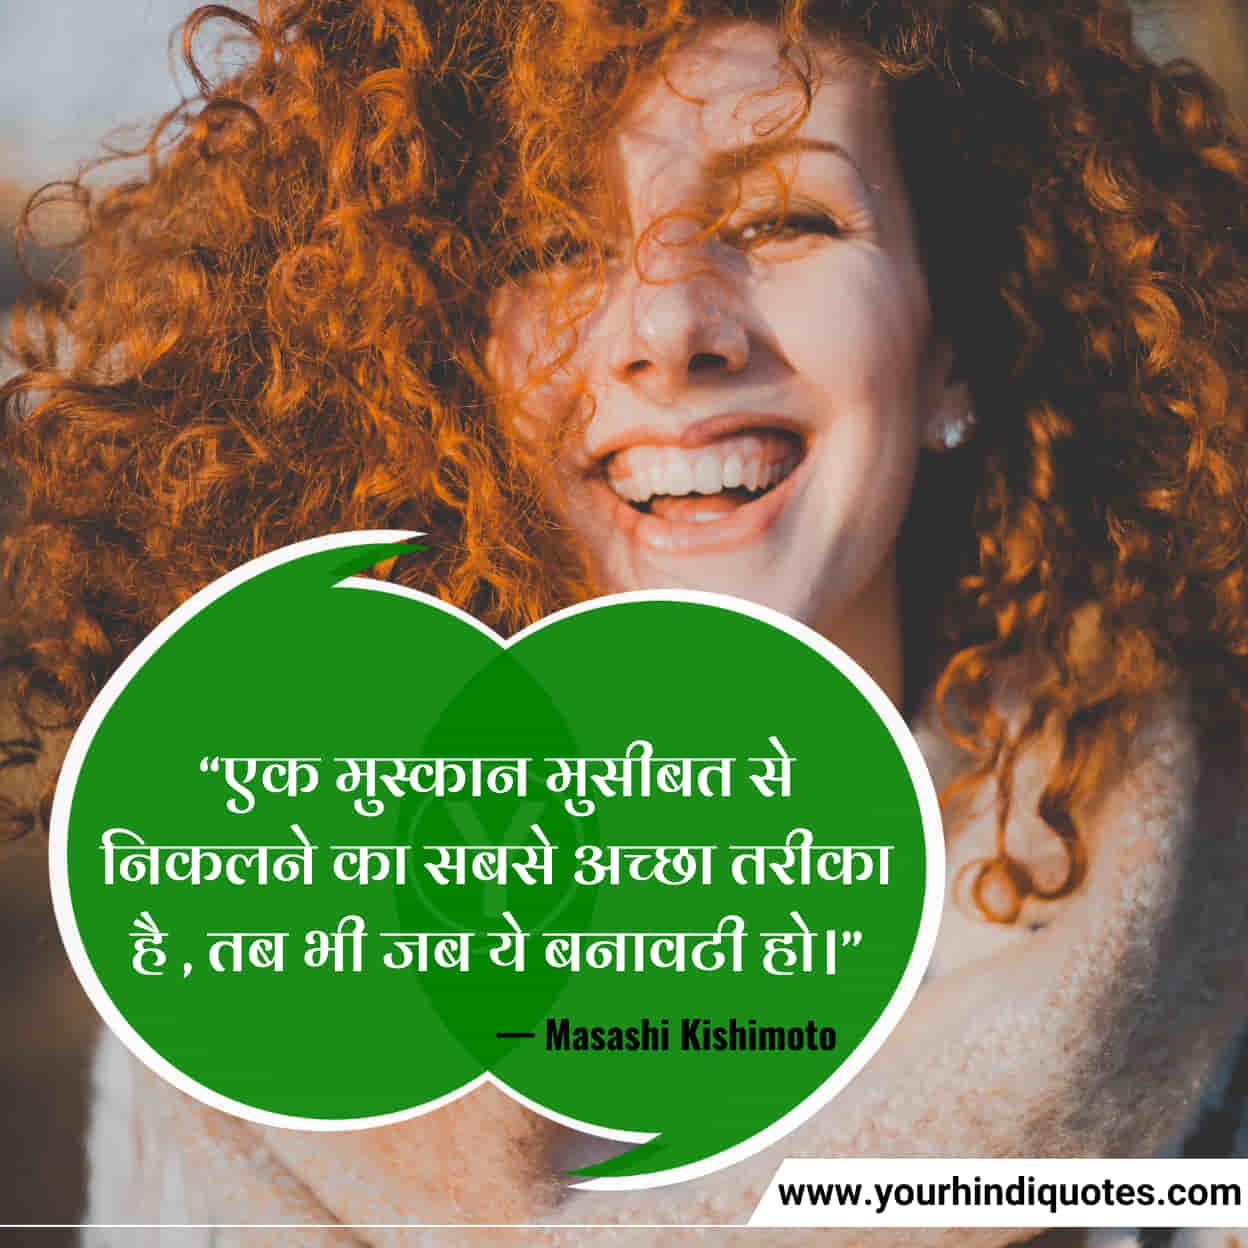 Hindi Smile Quotes